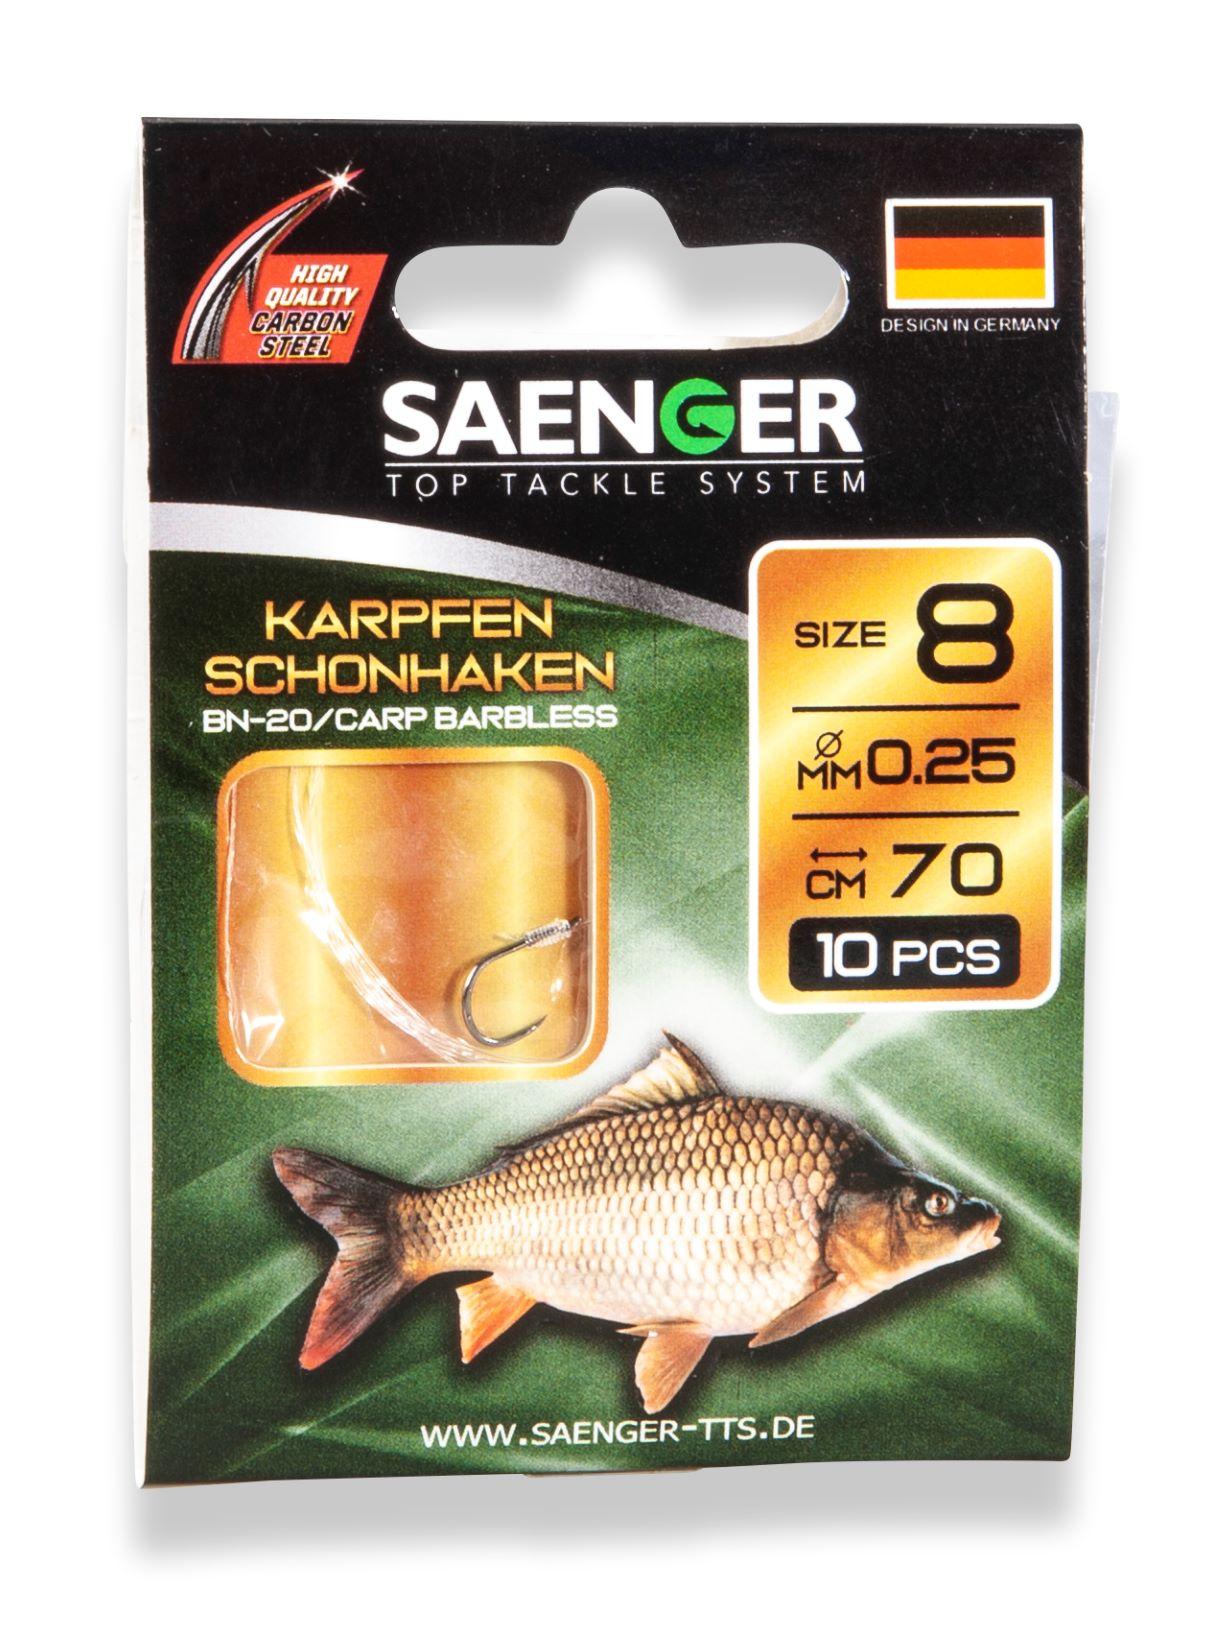 Saenger Návazec na kapry bezprotihrotý Karpfen Schonhaken vel. 8, 10 ks/bal